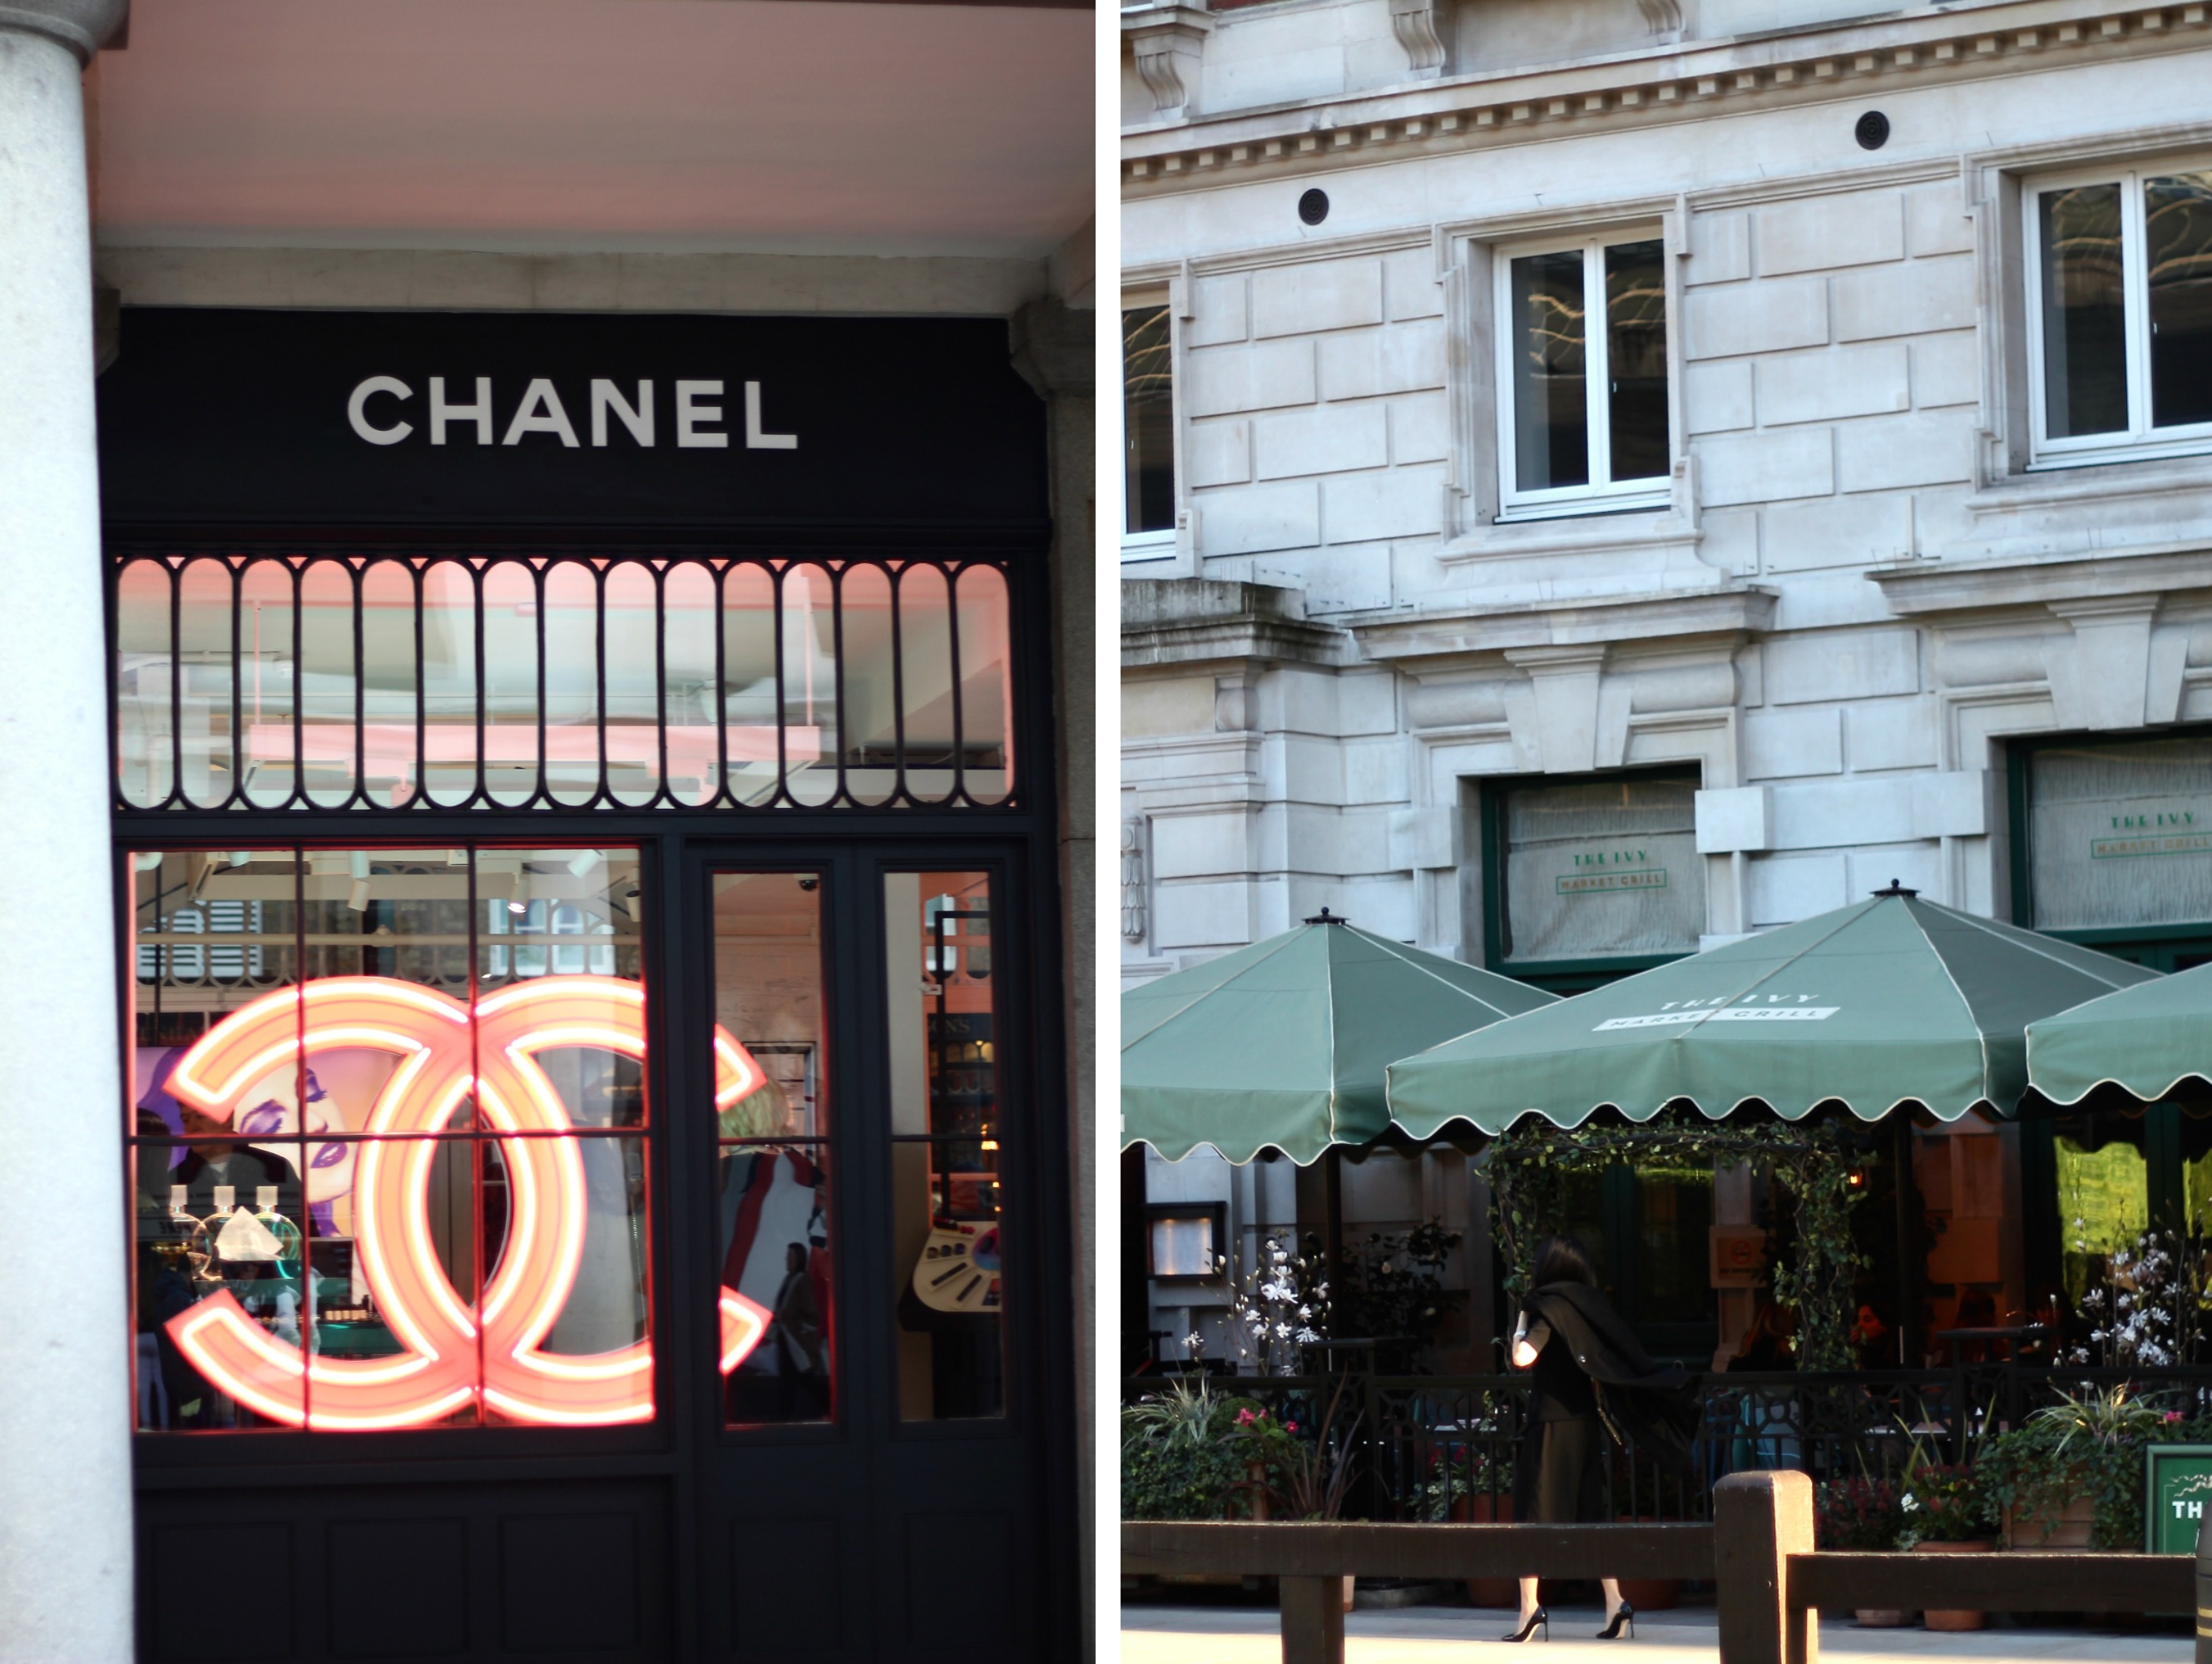 Convert Garden London - Chanel - Caffé - katiys.com